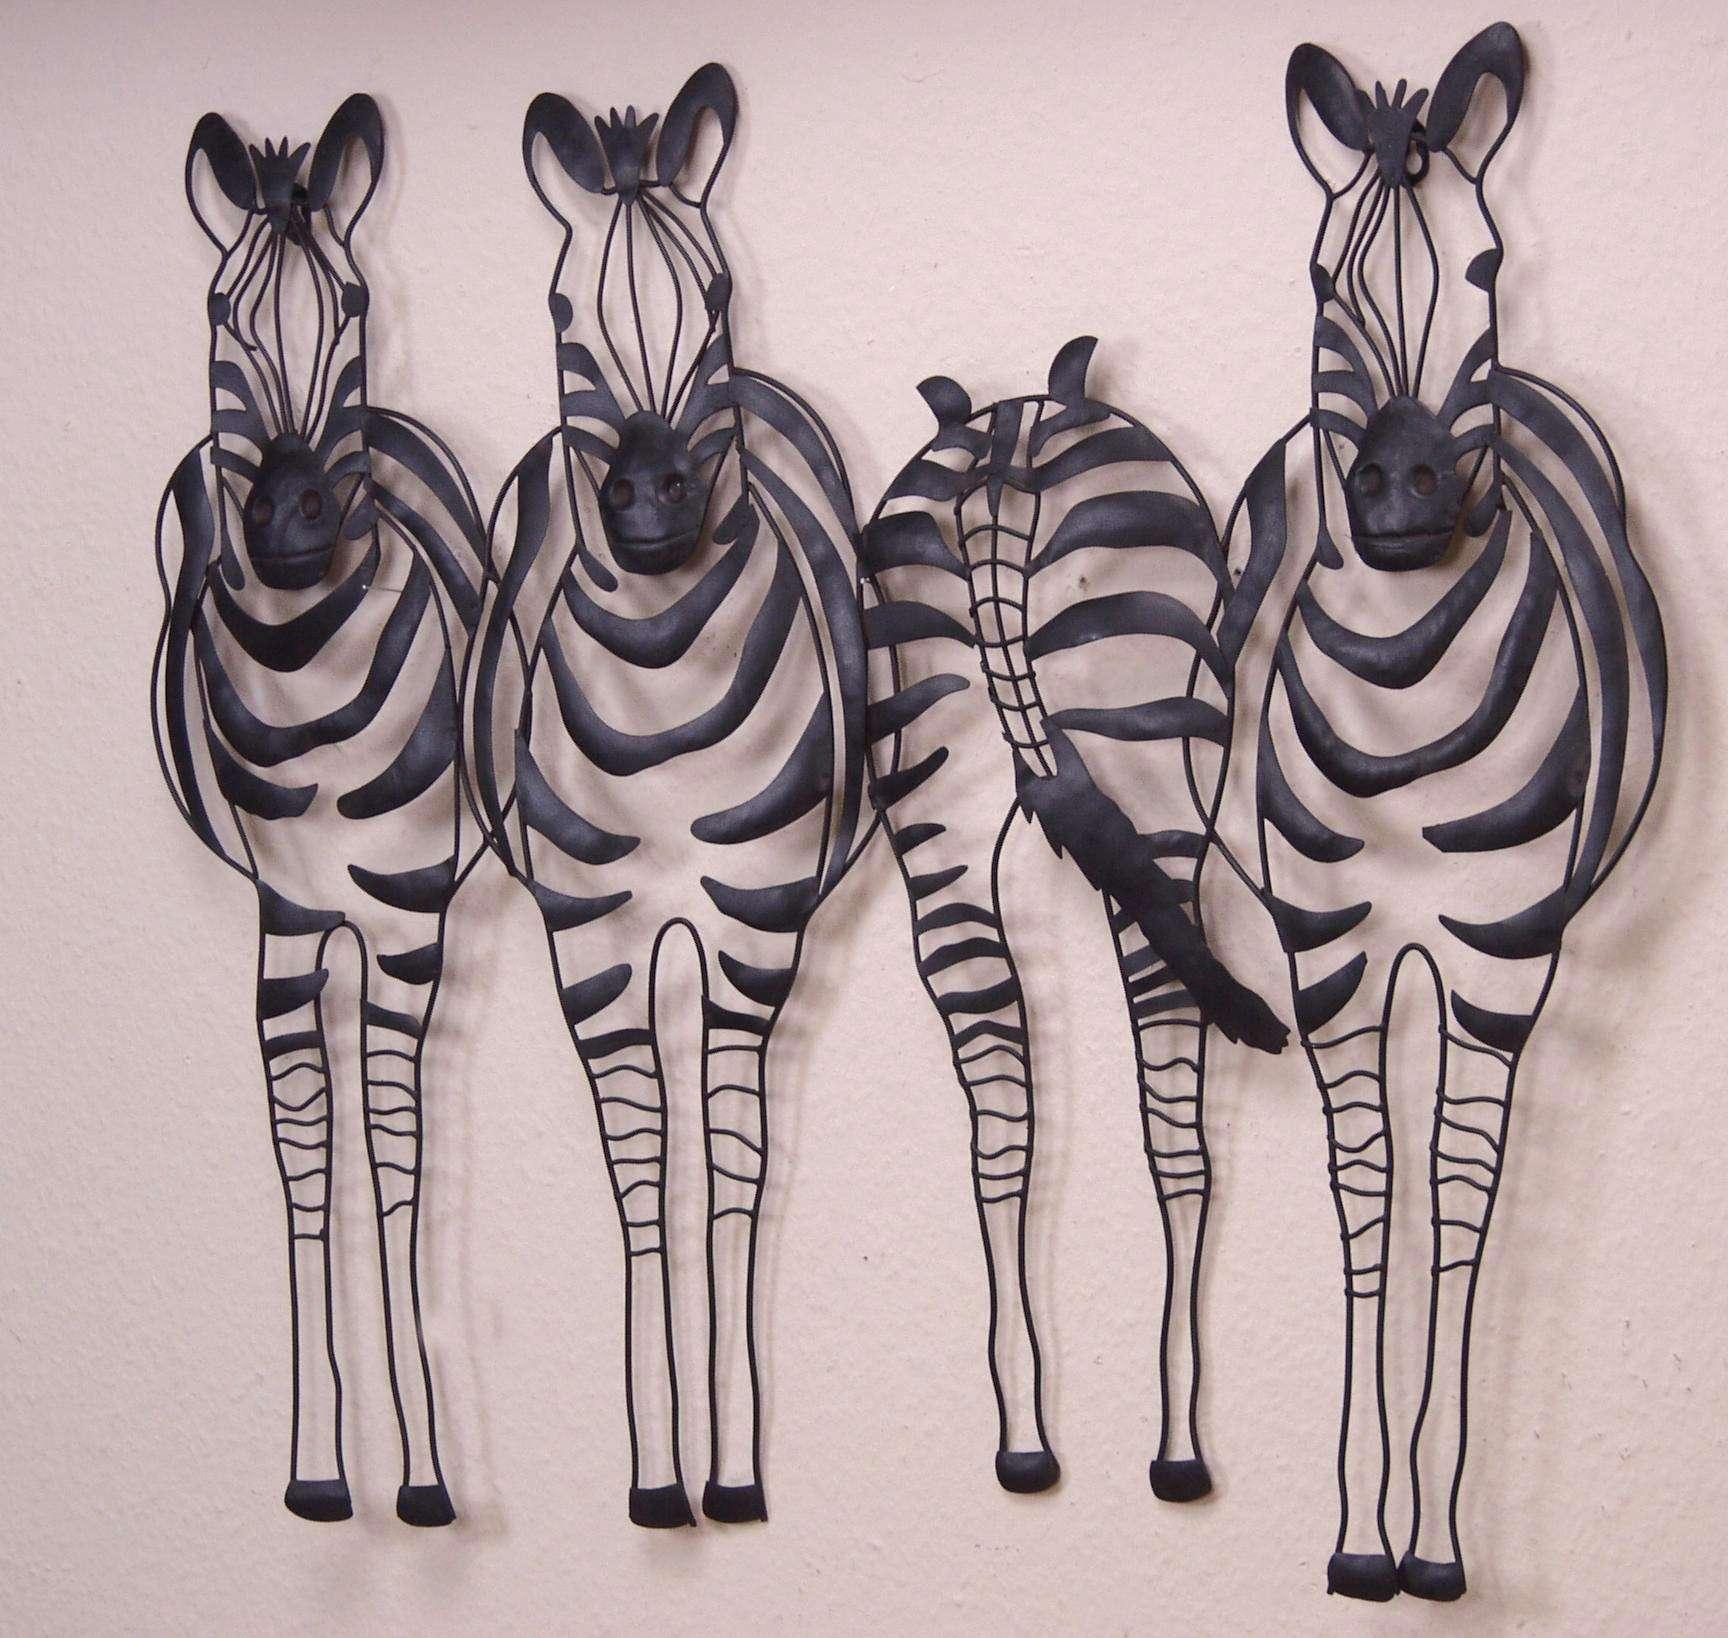 wanddeko zebra bestseller shop mit top marken. Black Bedroom Furniture Sets. Home Design Ideas